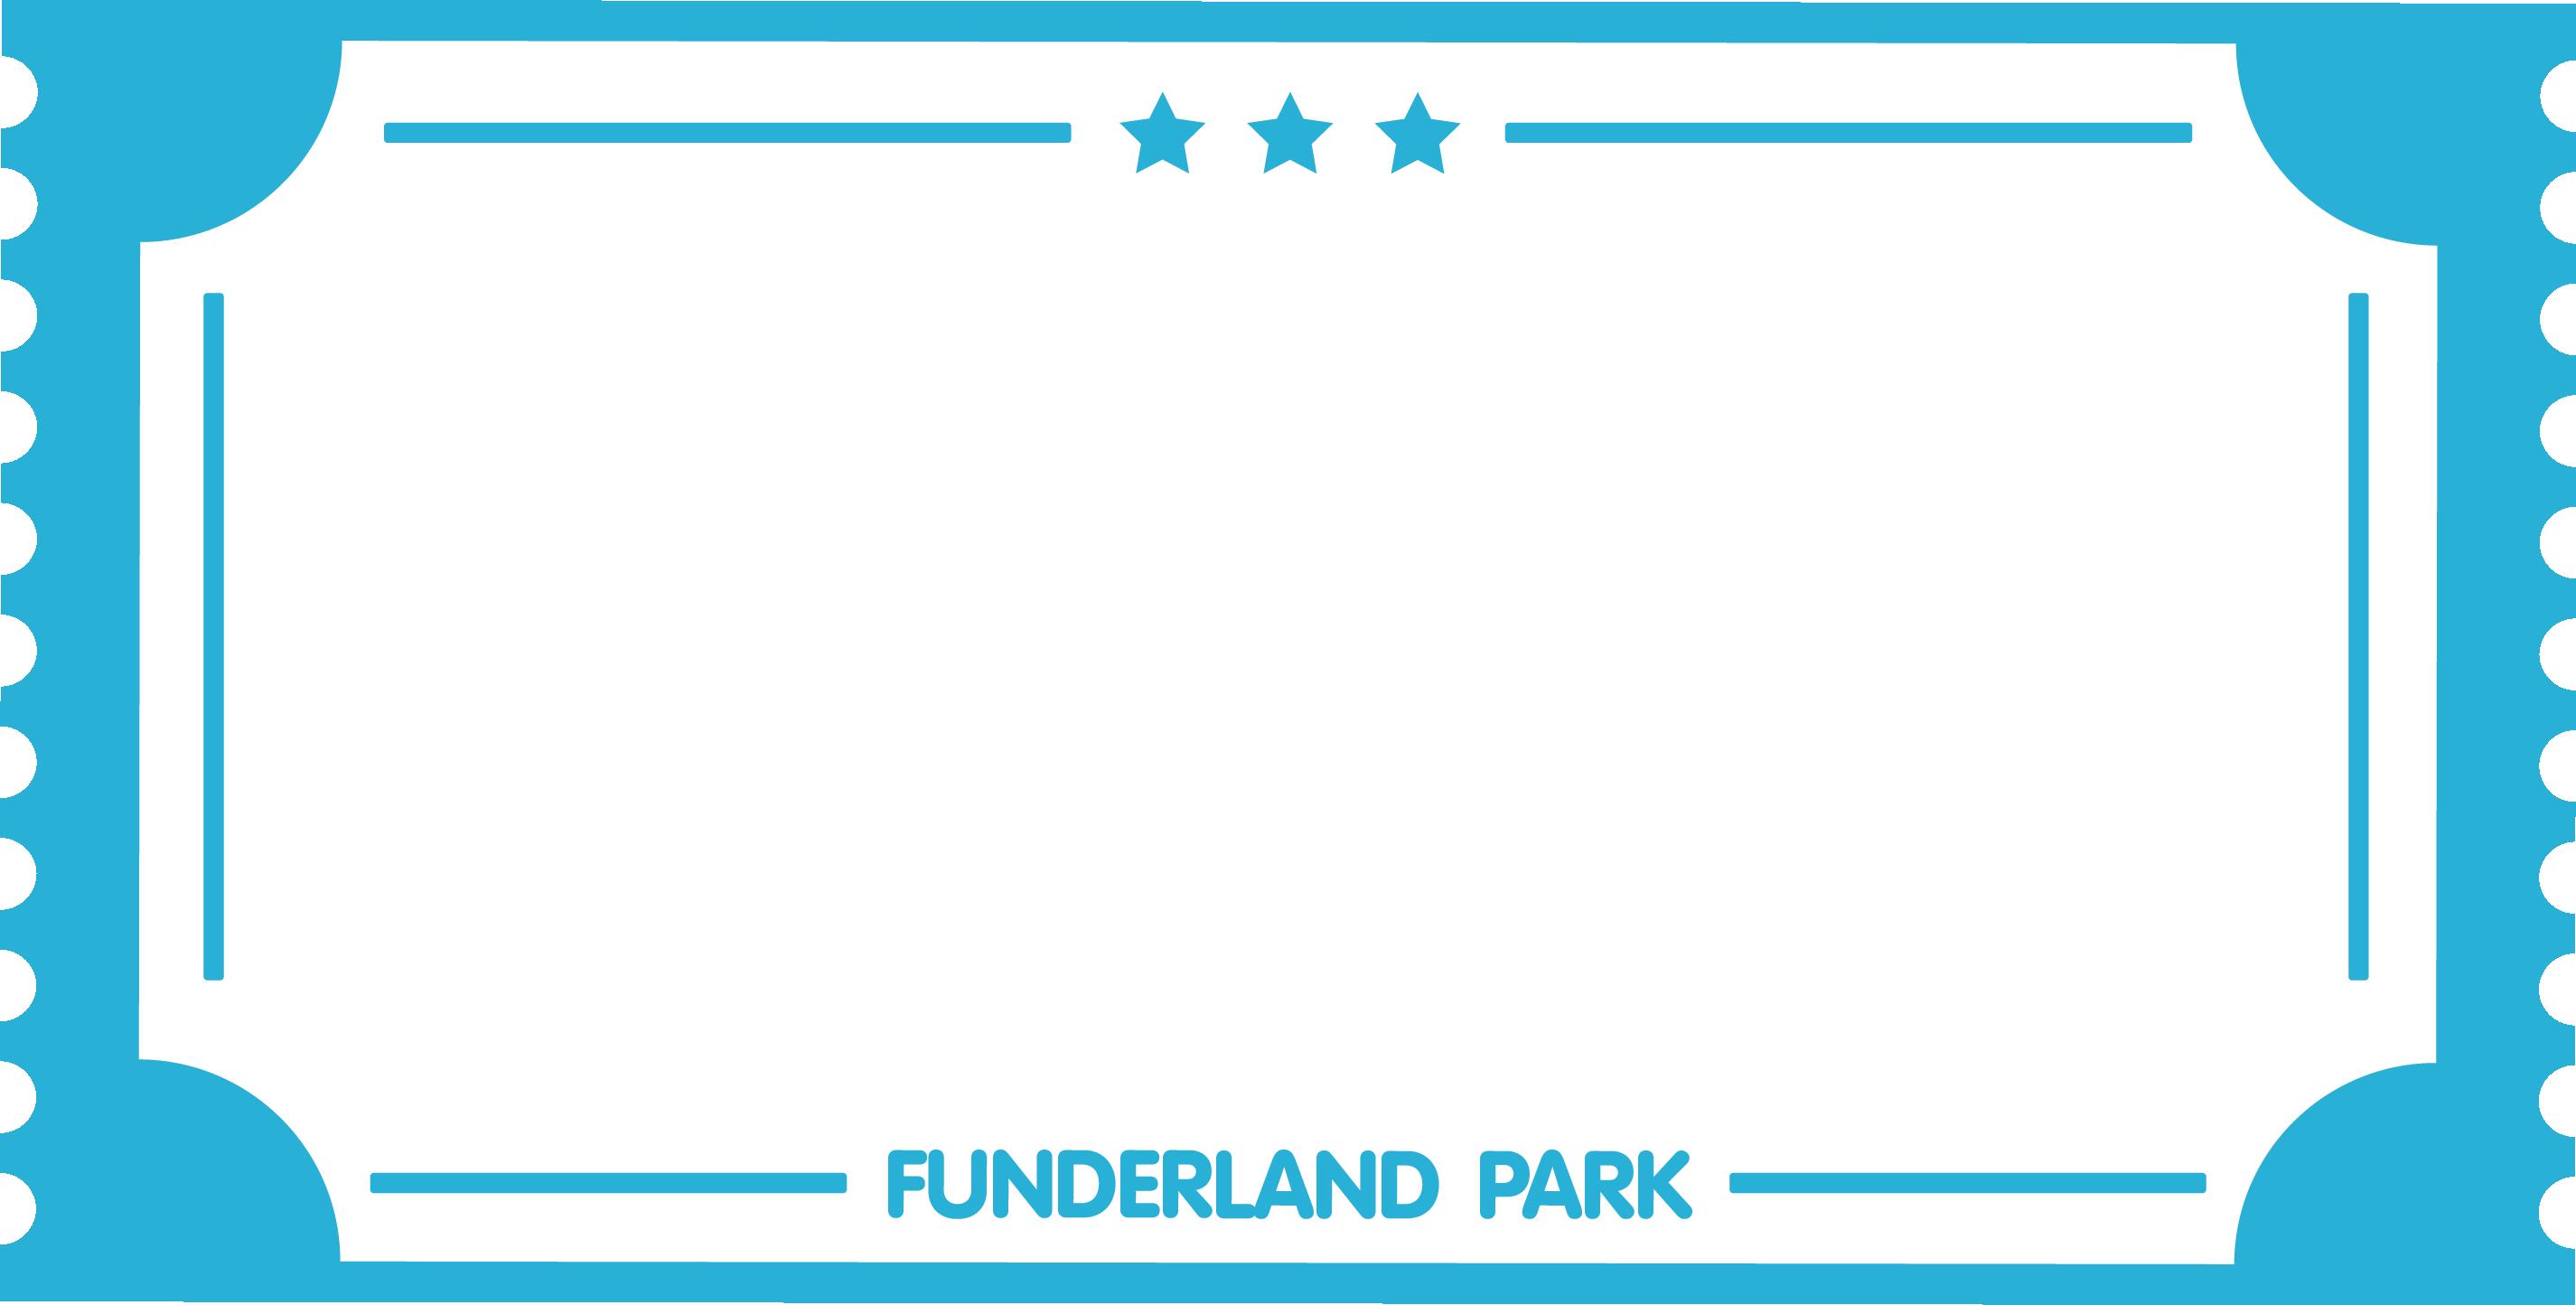 Background Ticket Image